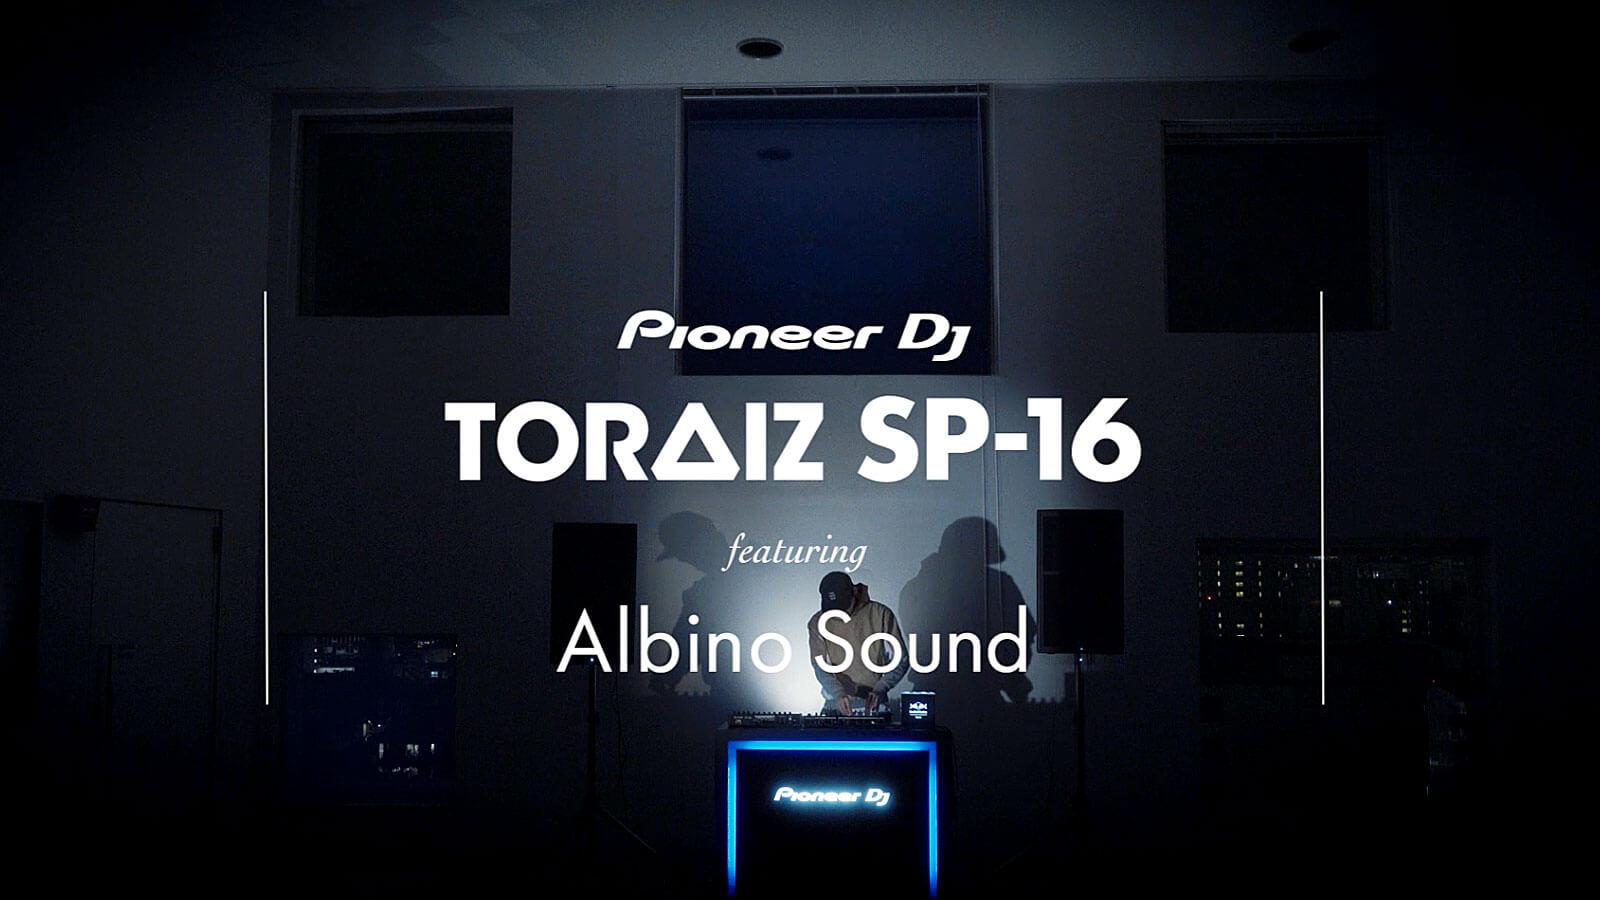 Pioneer DJ Toraiz SP-16 feat. Albino Sound